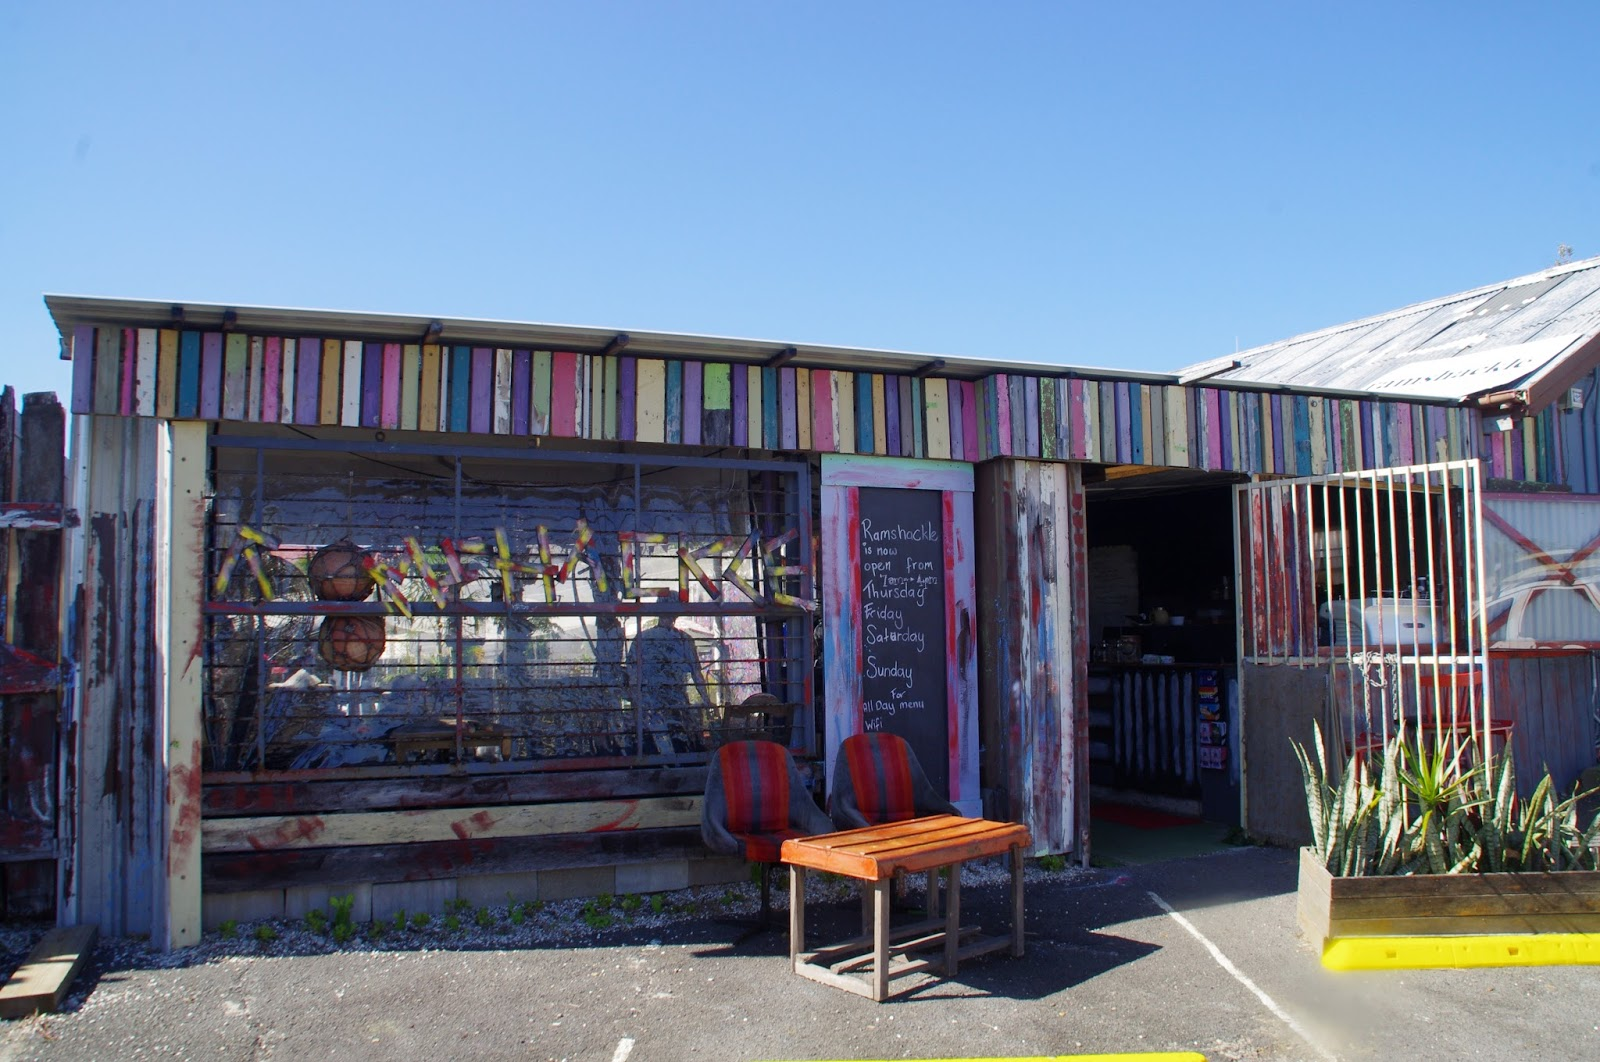 Gold Coast Shabby Chic Cafe